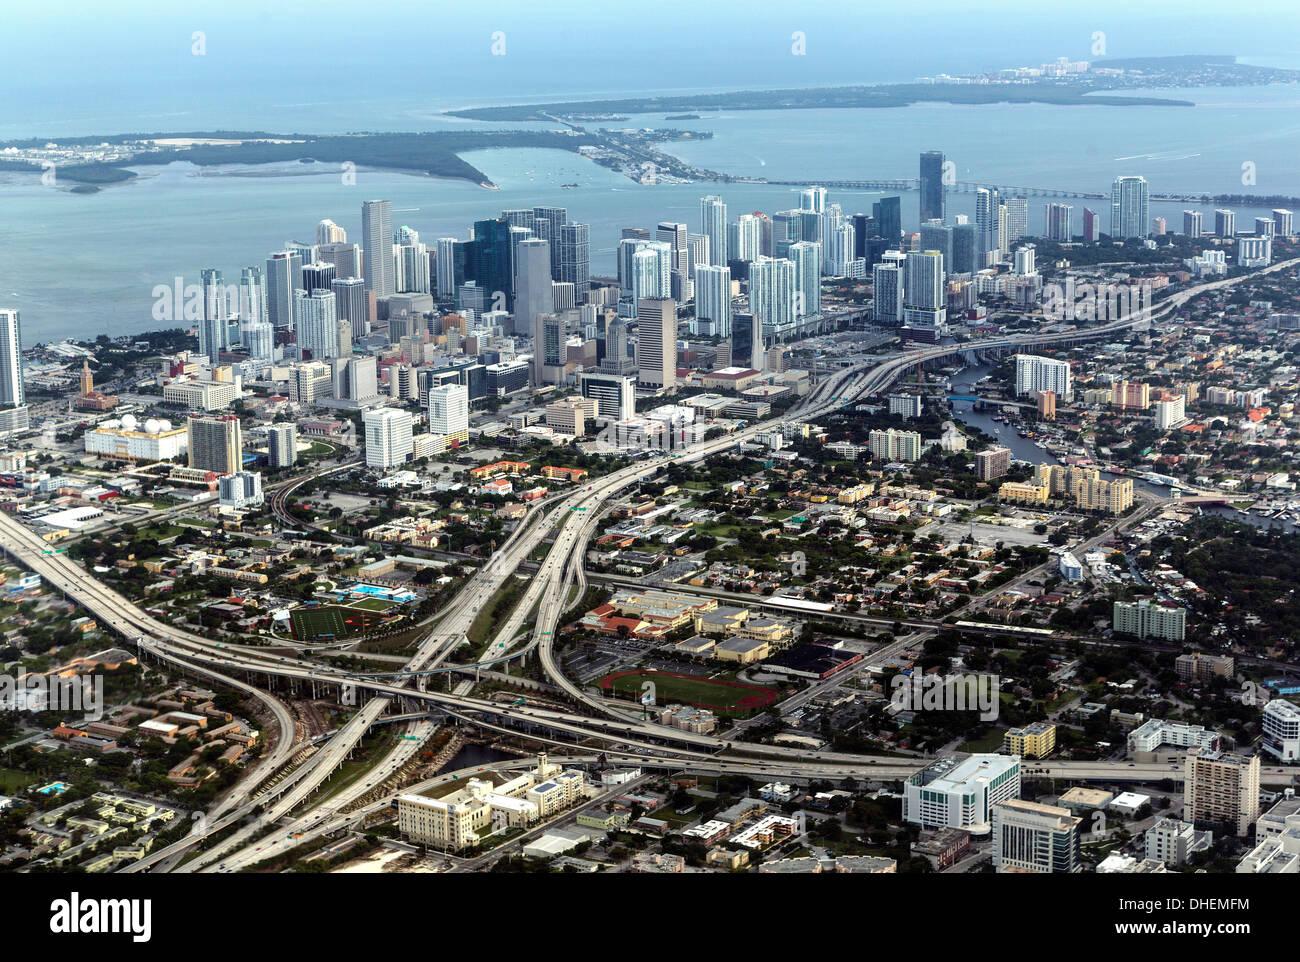 Aerial view of Miami, Florida, United States of America, North America - Stock Image